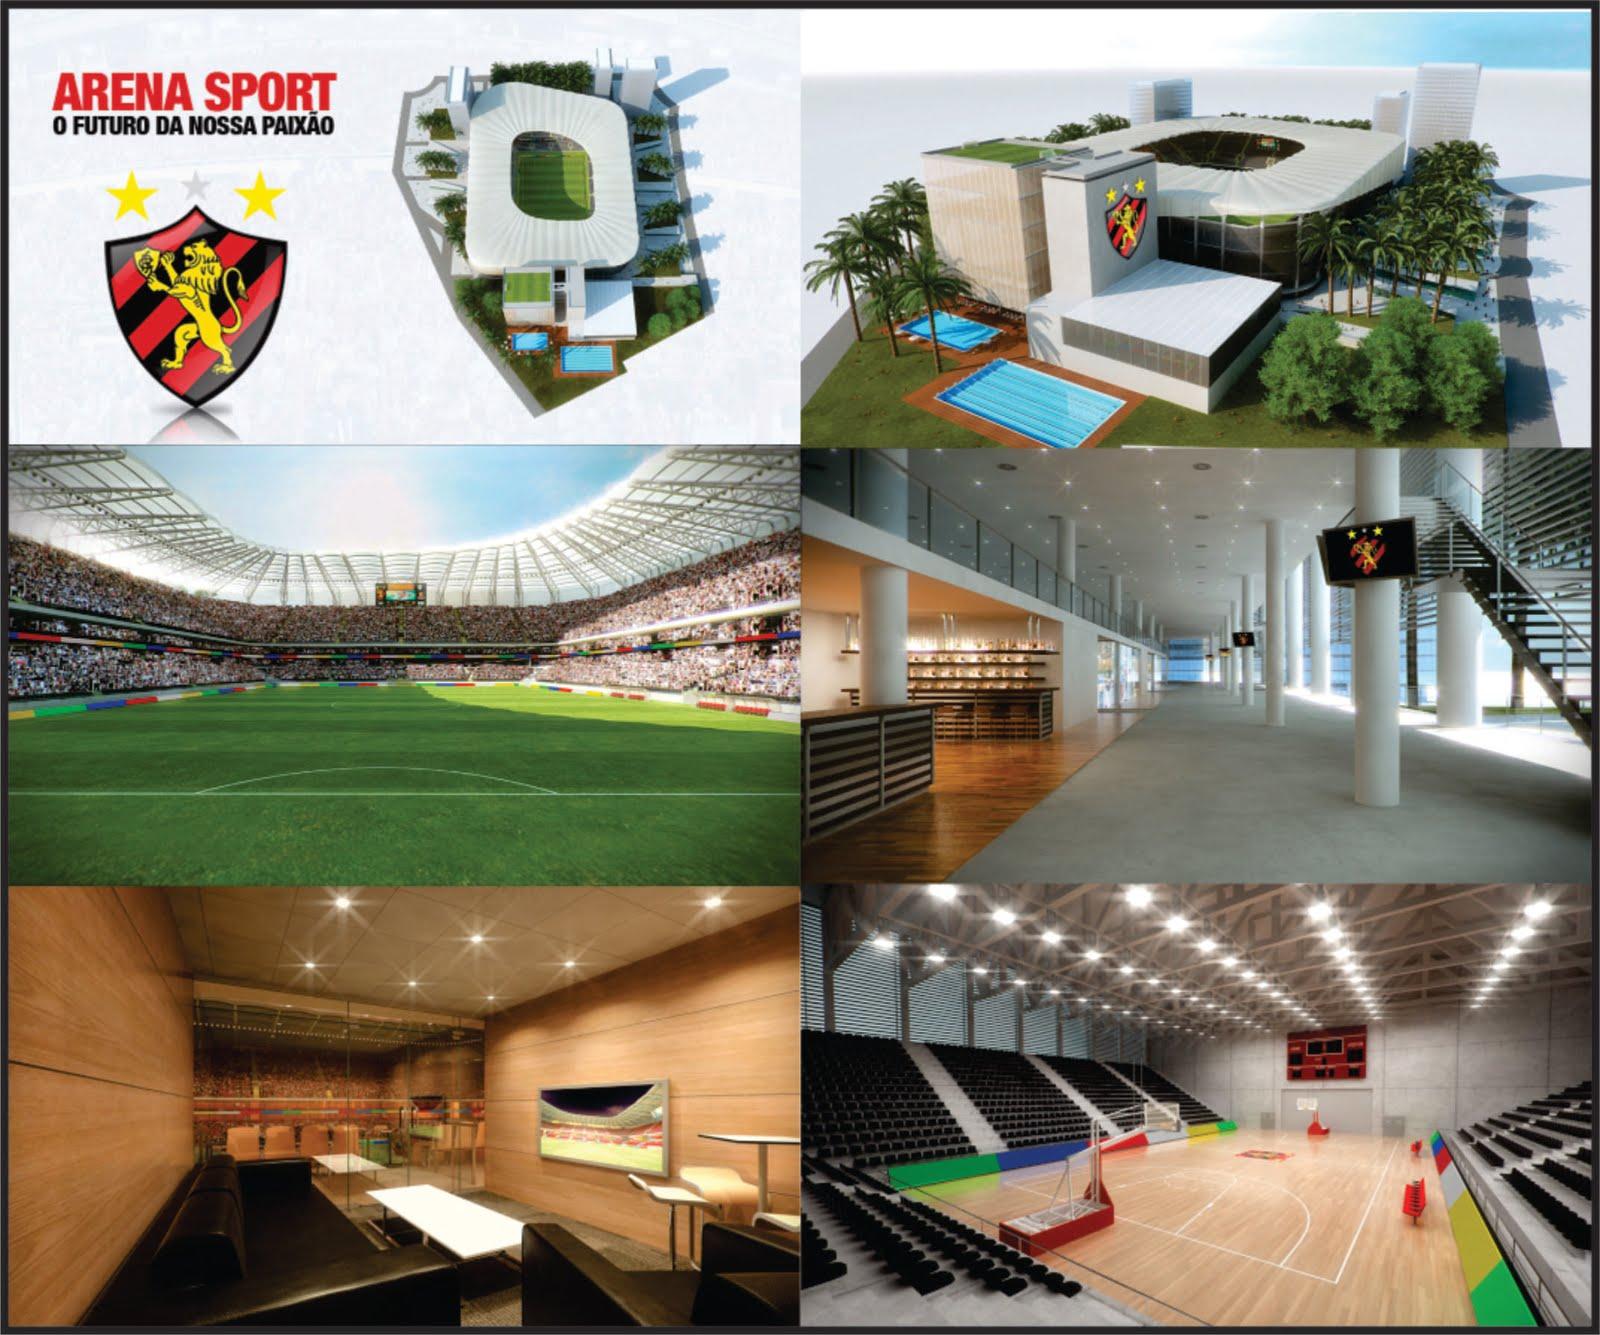 arena sport 1 program